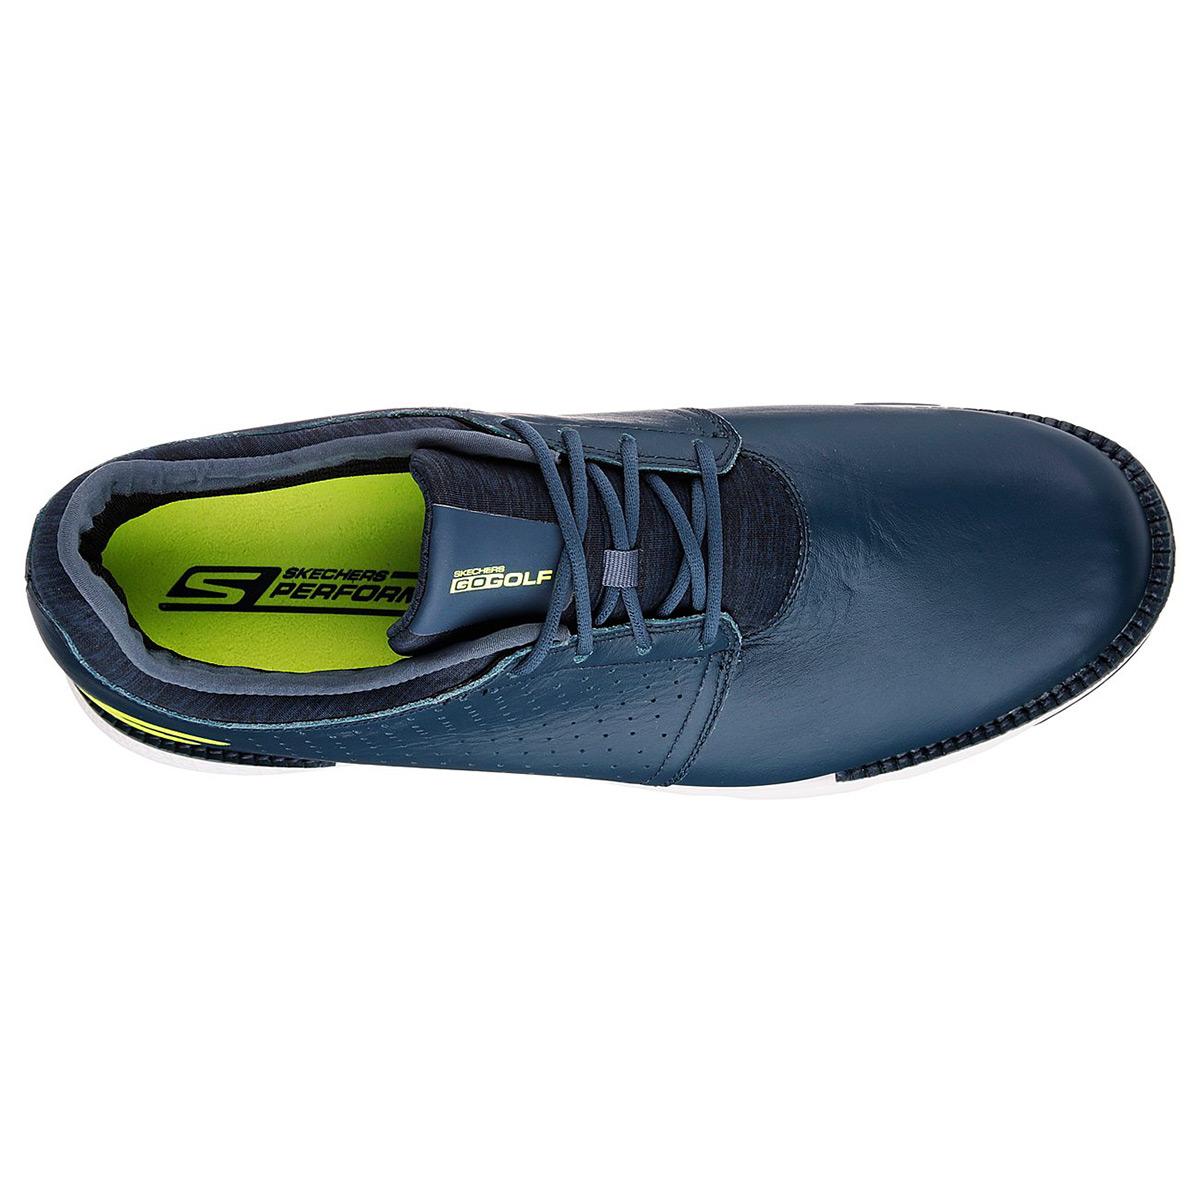 Skechers-Golf-Mens-2019-Go-Elite-V-3-Spikeless-Waterproof-Leather-Golf-Shoes thumbnail 10